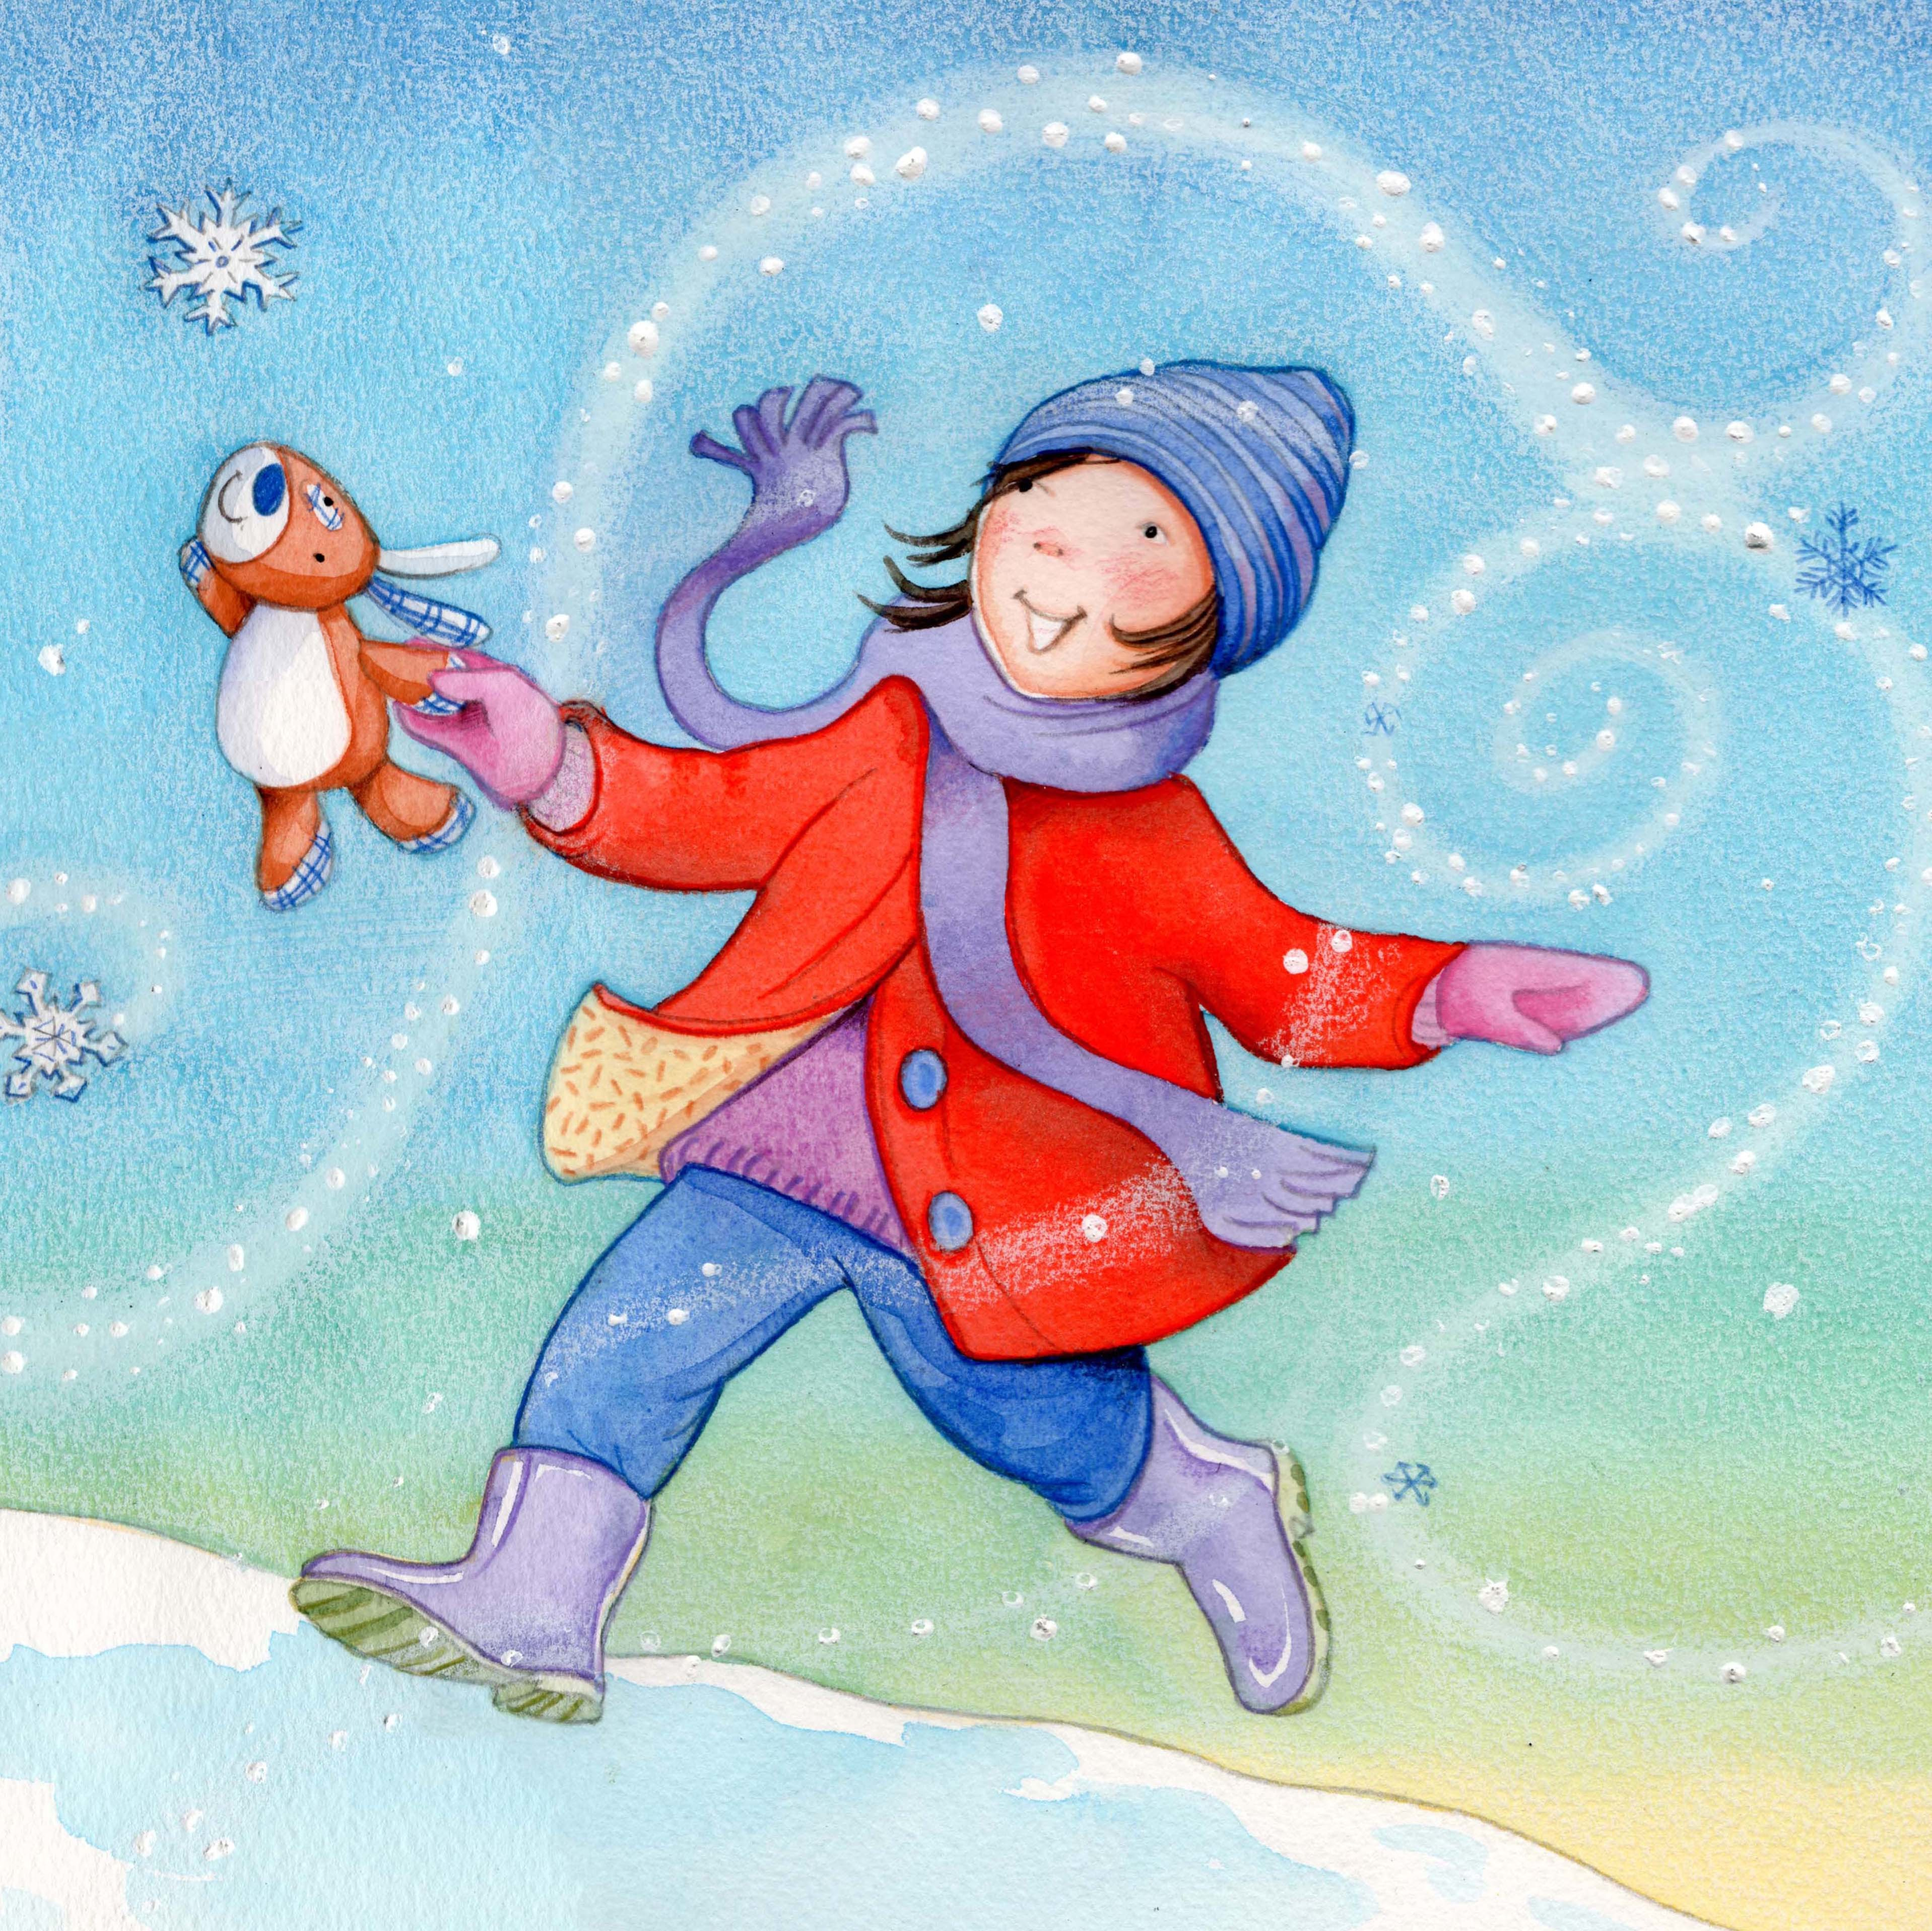 Running through the Snow